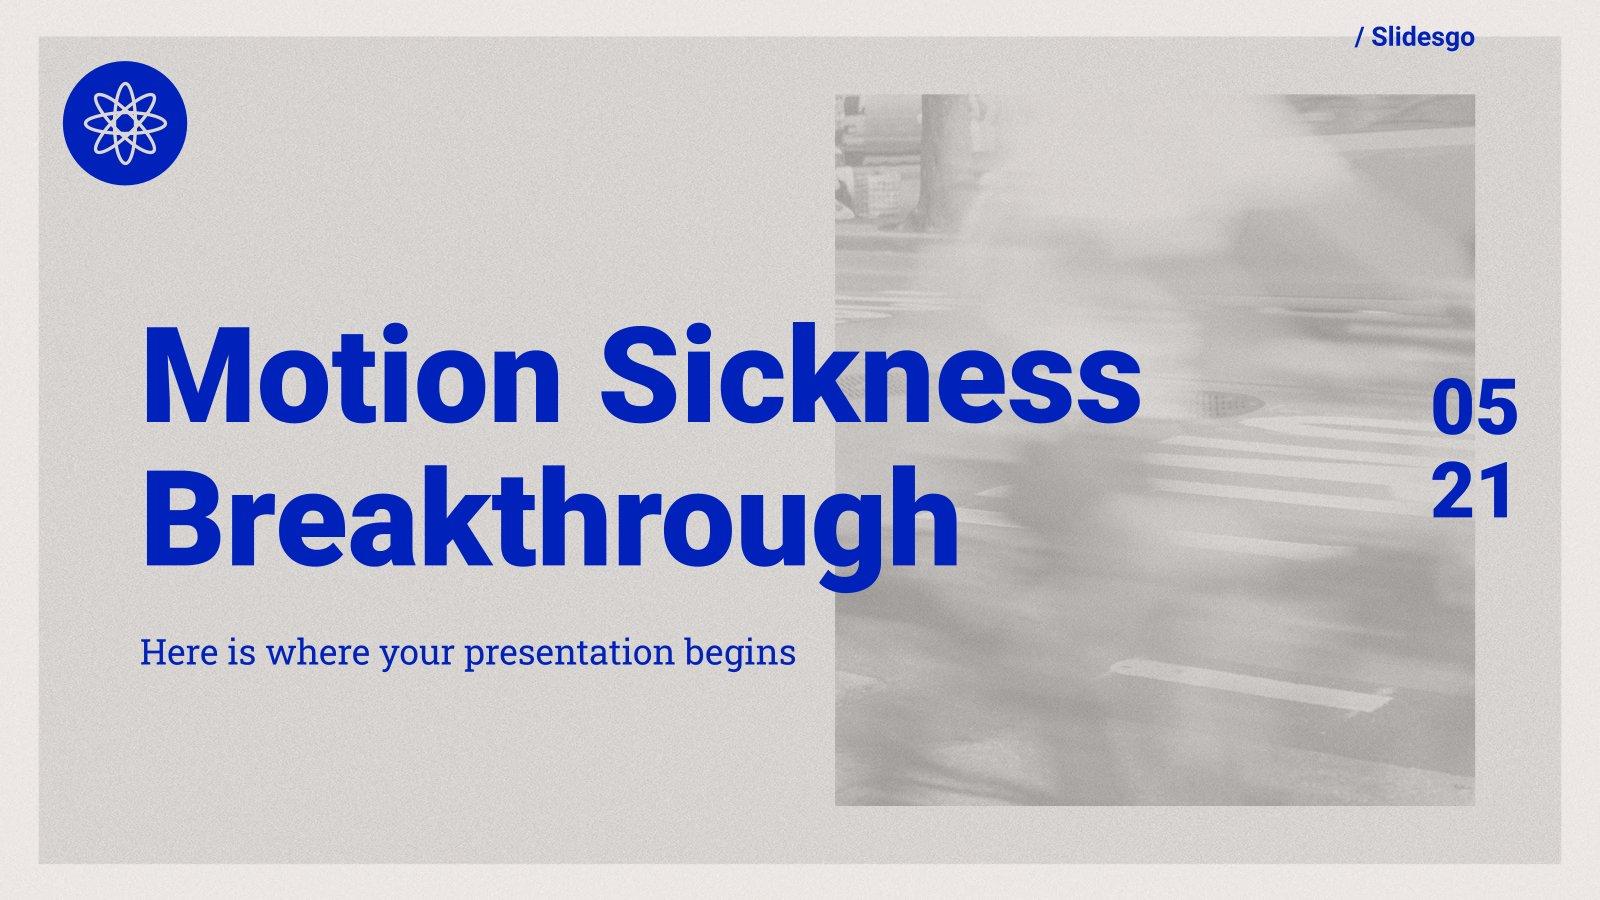 Motion Sickness Breakthrough presentation template